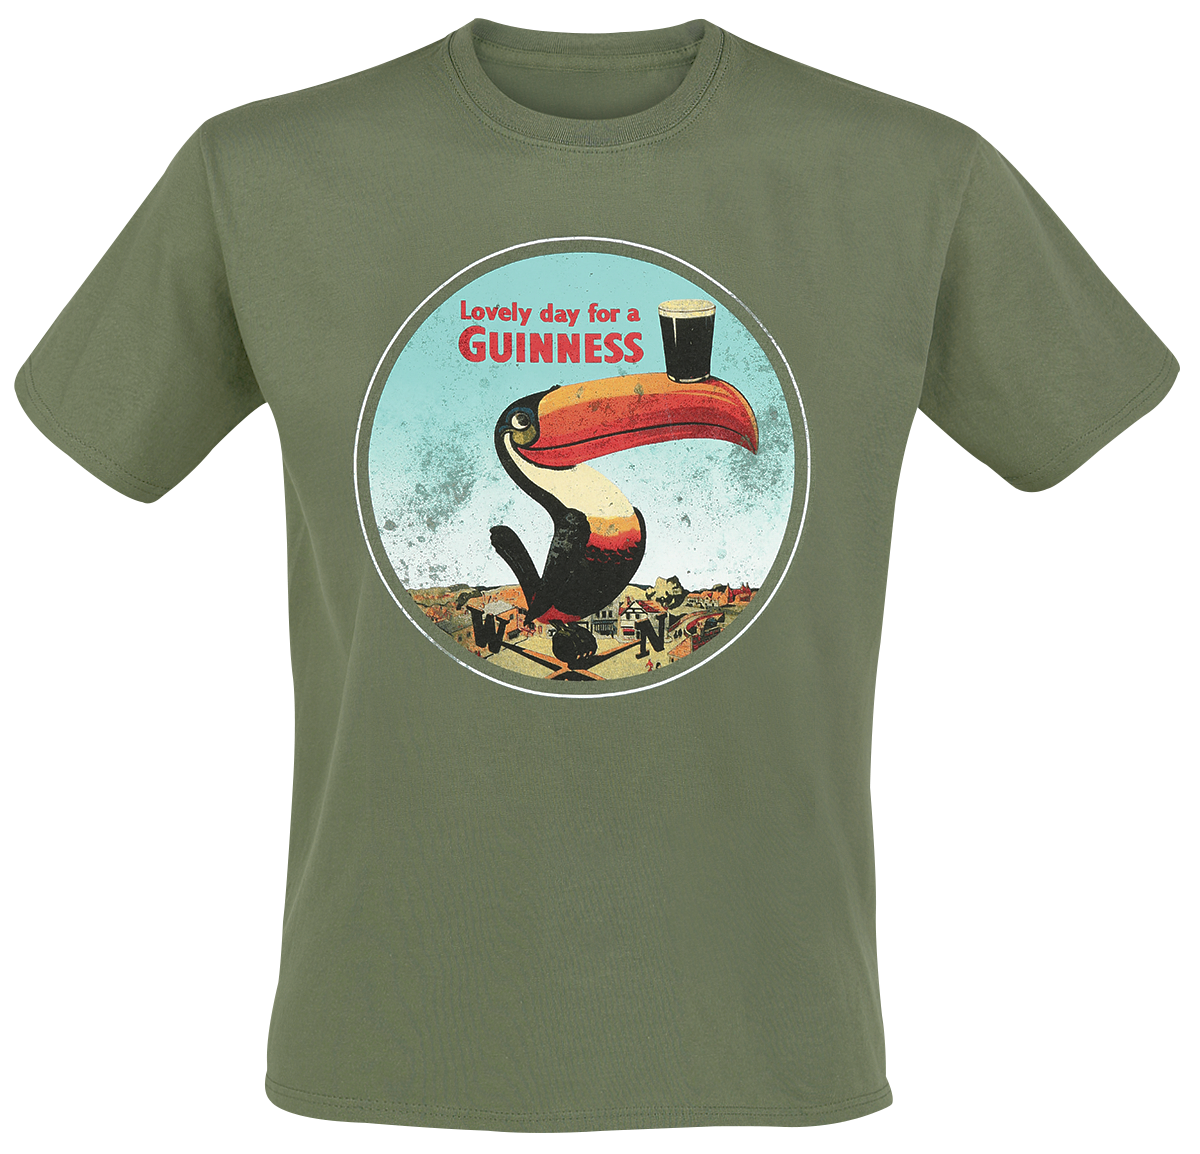 Guinness - Lovely Day For A Guinness - T-Shirt - olive image